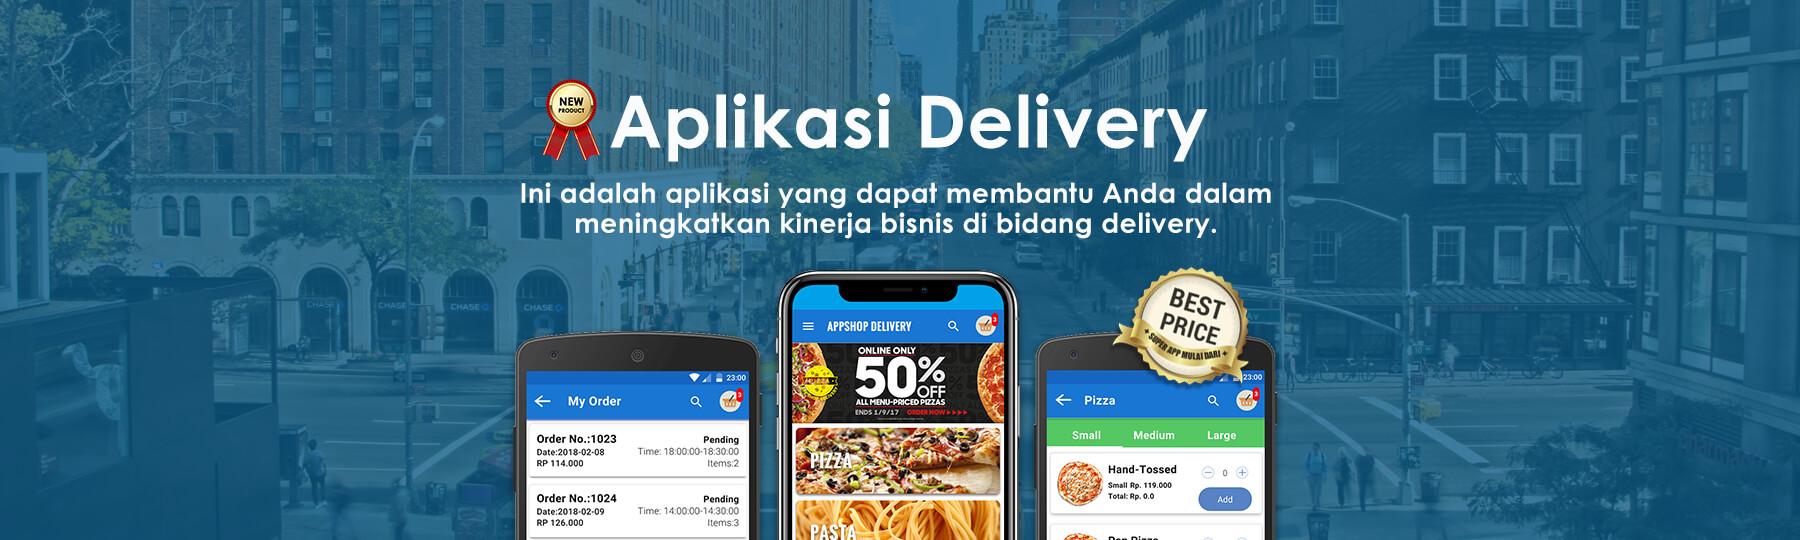 Aplikasi Delivery